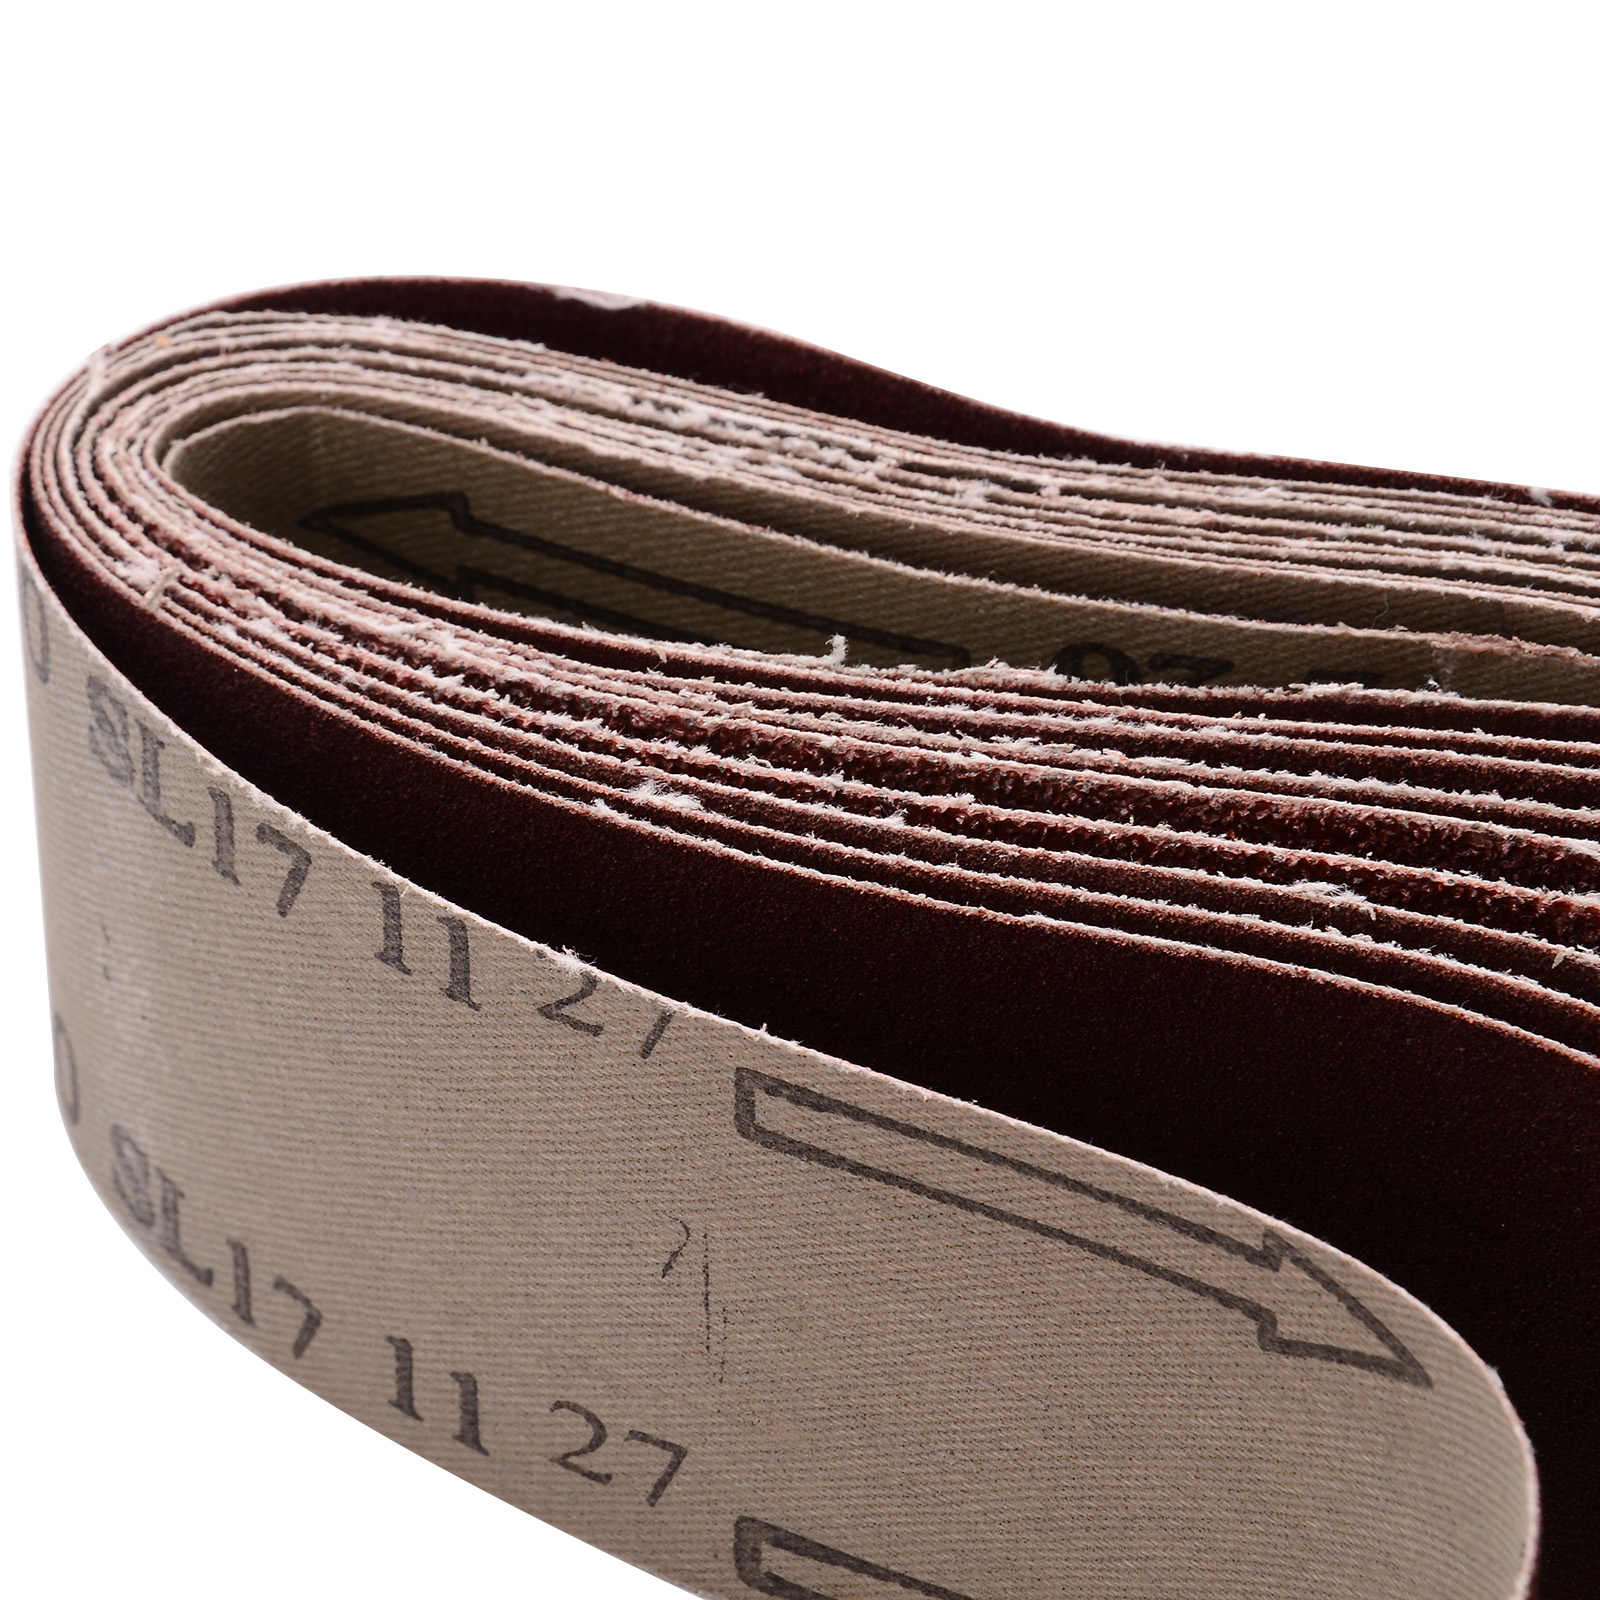 5 Pcs 75mm x 533mm Coarse 40 Grit Abrasive Sanding Belts Electric Belt Sander